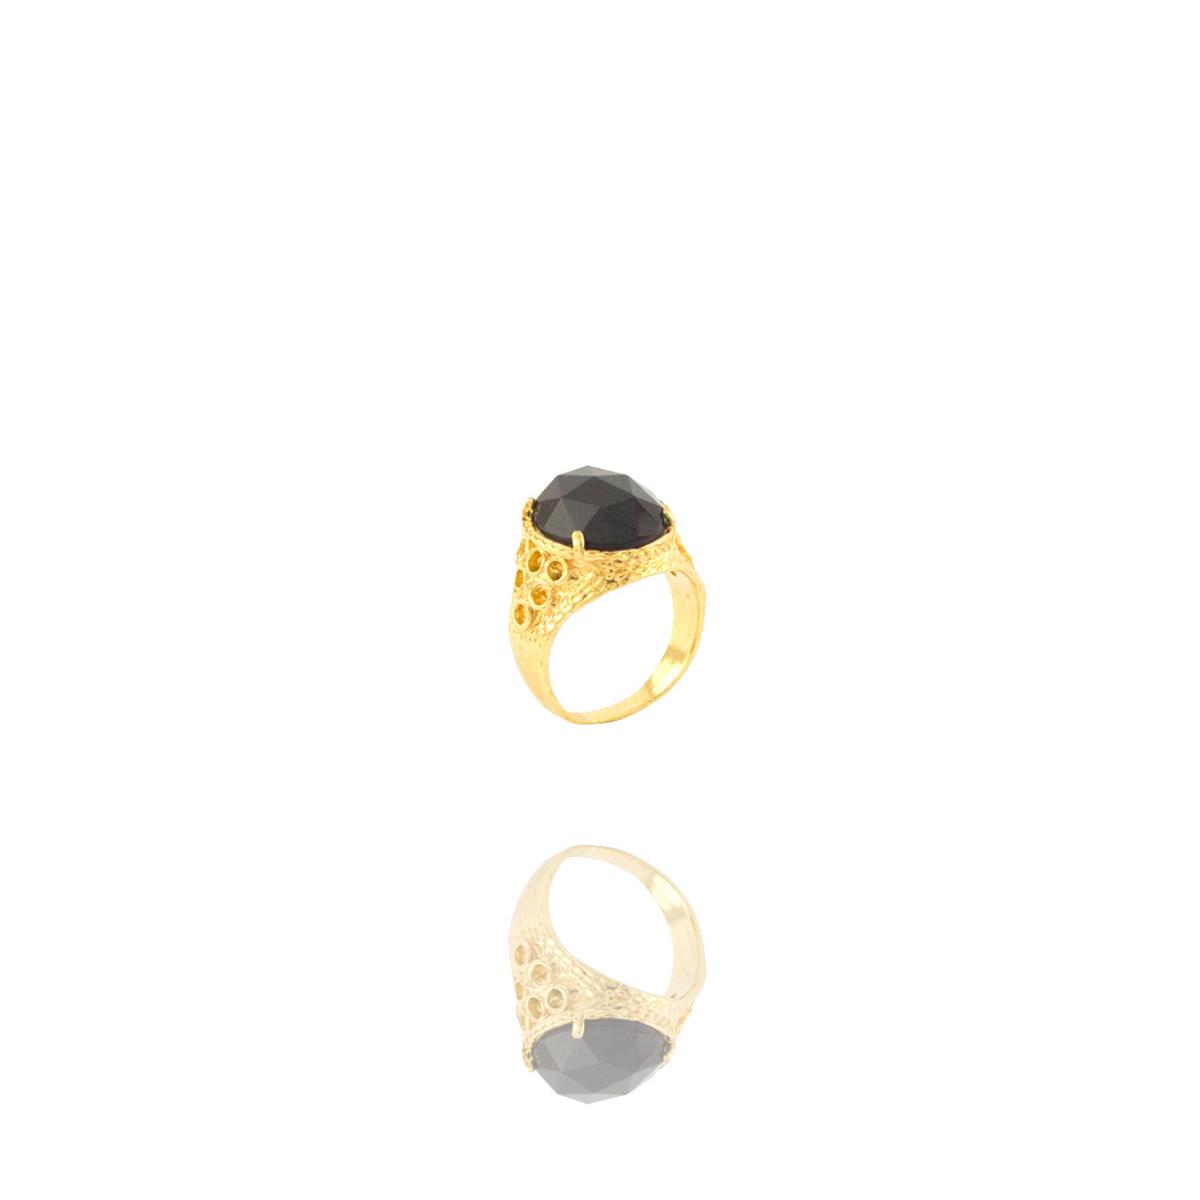 Anel Barbara Strauss Semi Joia Boston Em Resina Lalique Preto, Rev. Em Ouro Amarelo 18K